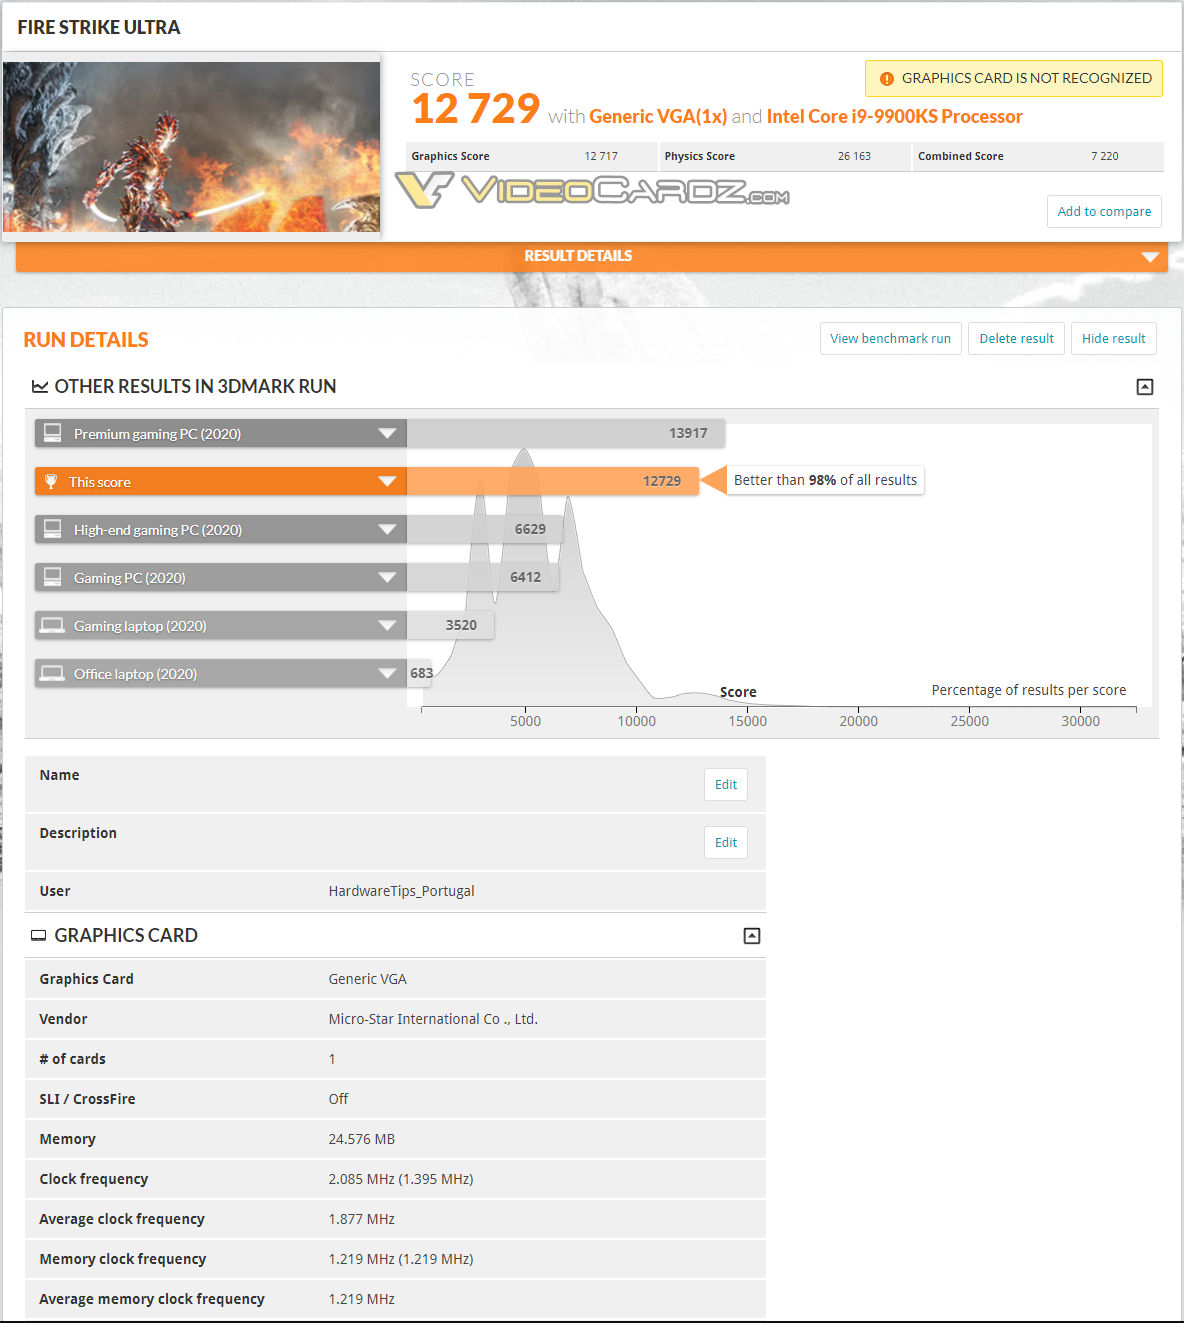 nvidia-geforce-rtx-3090-fs-ultra